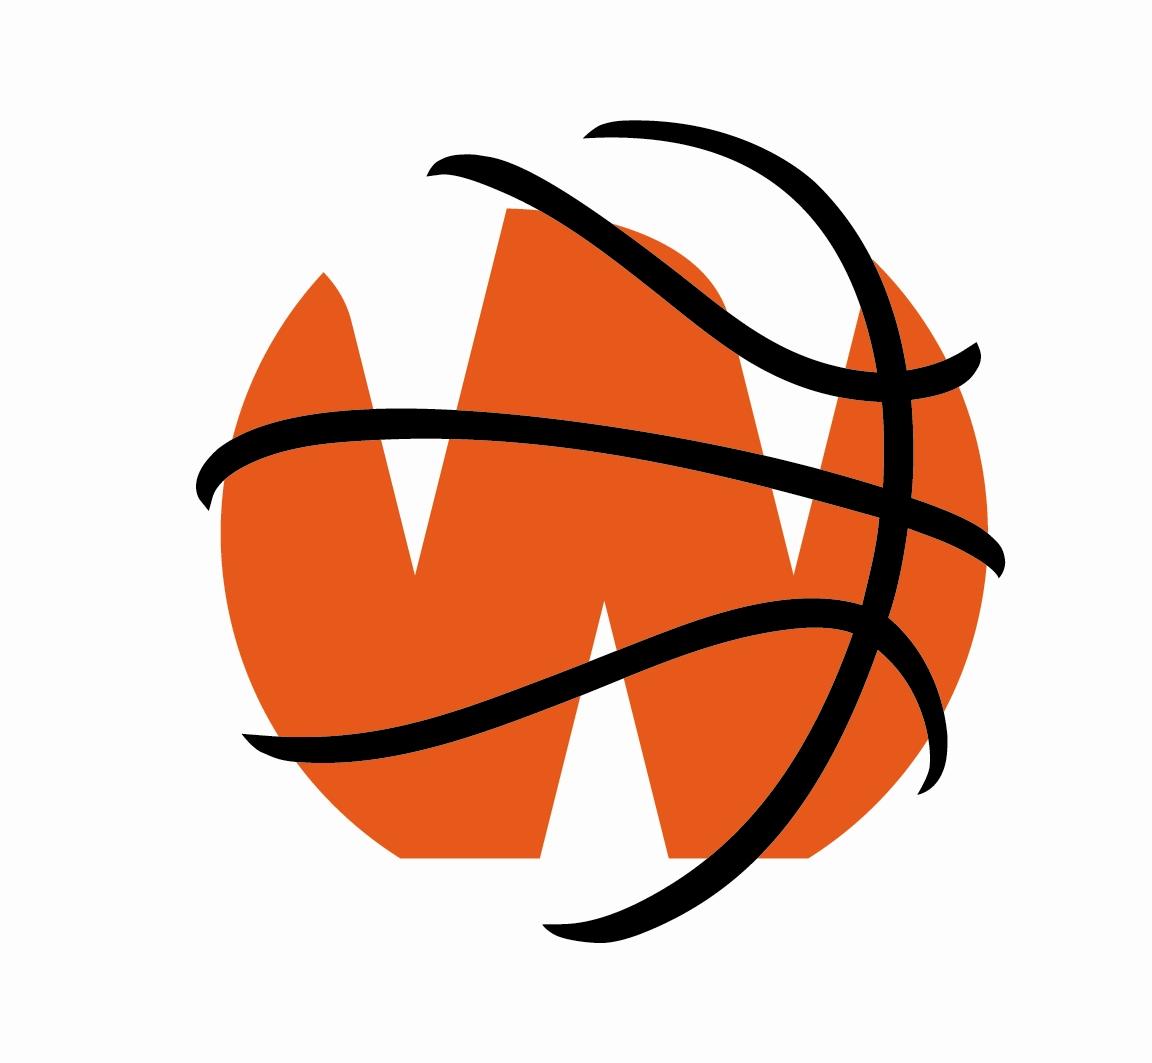 Basketball Logo Wallpaper